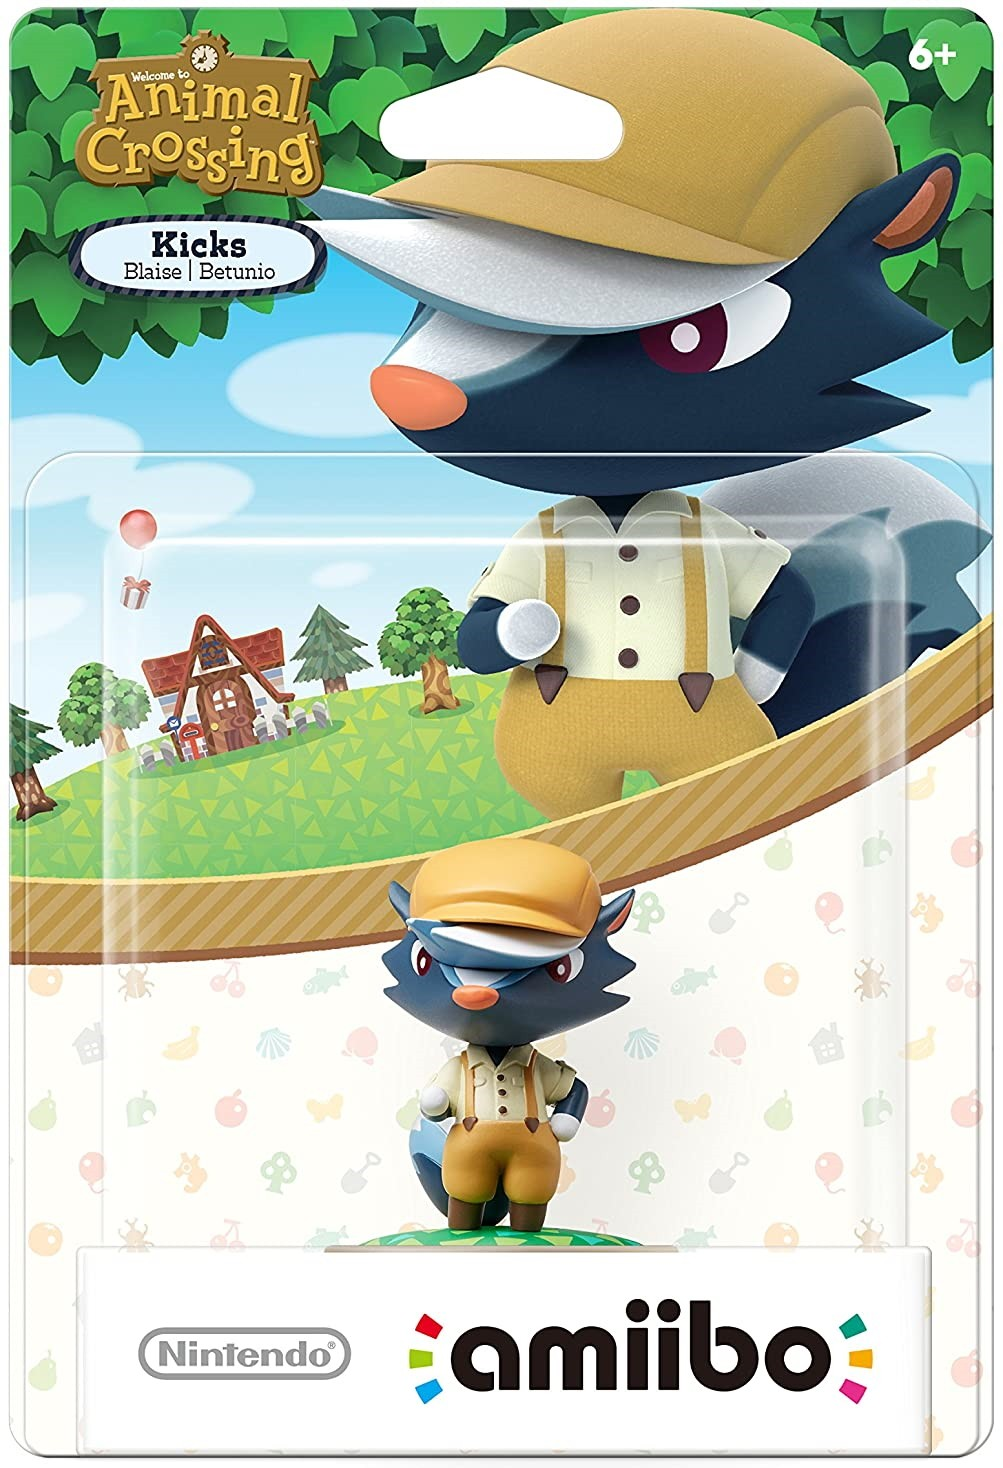 Animal Crossing Series Kicks amiibo. Інтерактивна фігурка amiibo